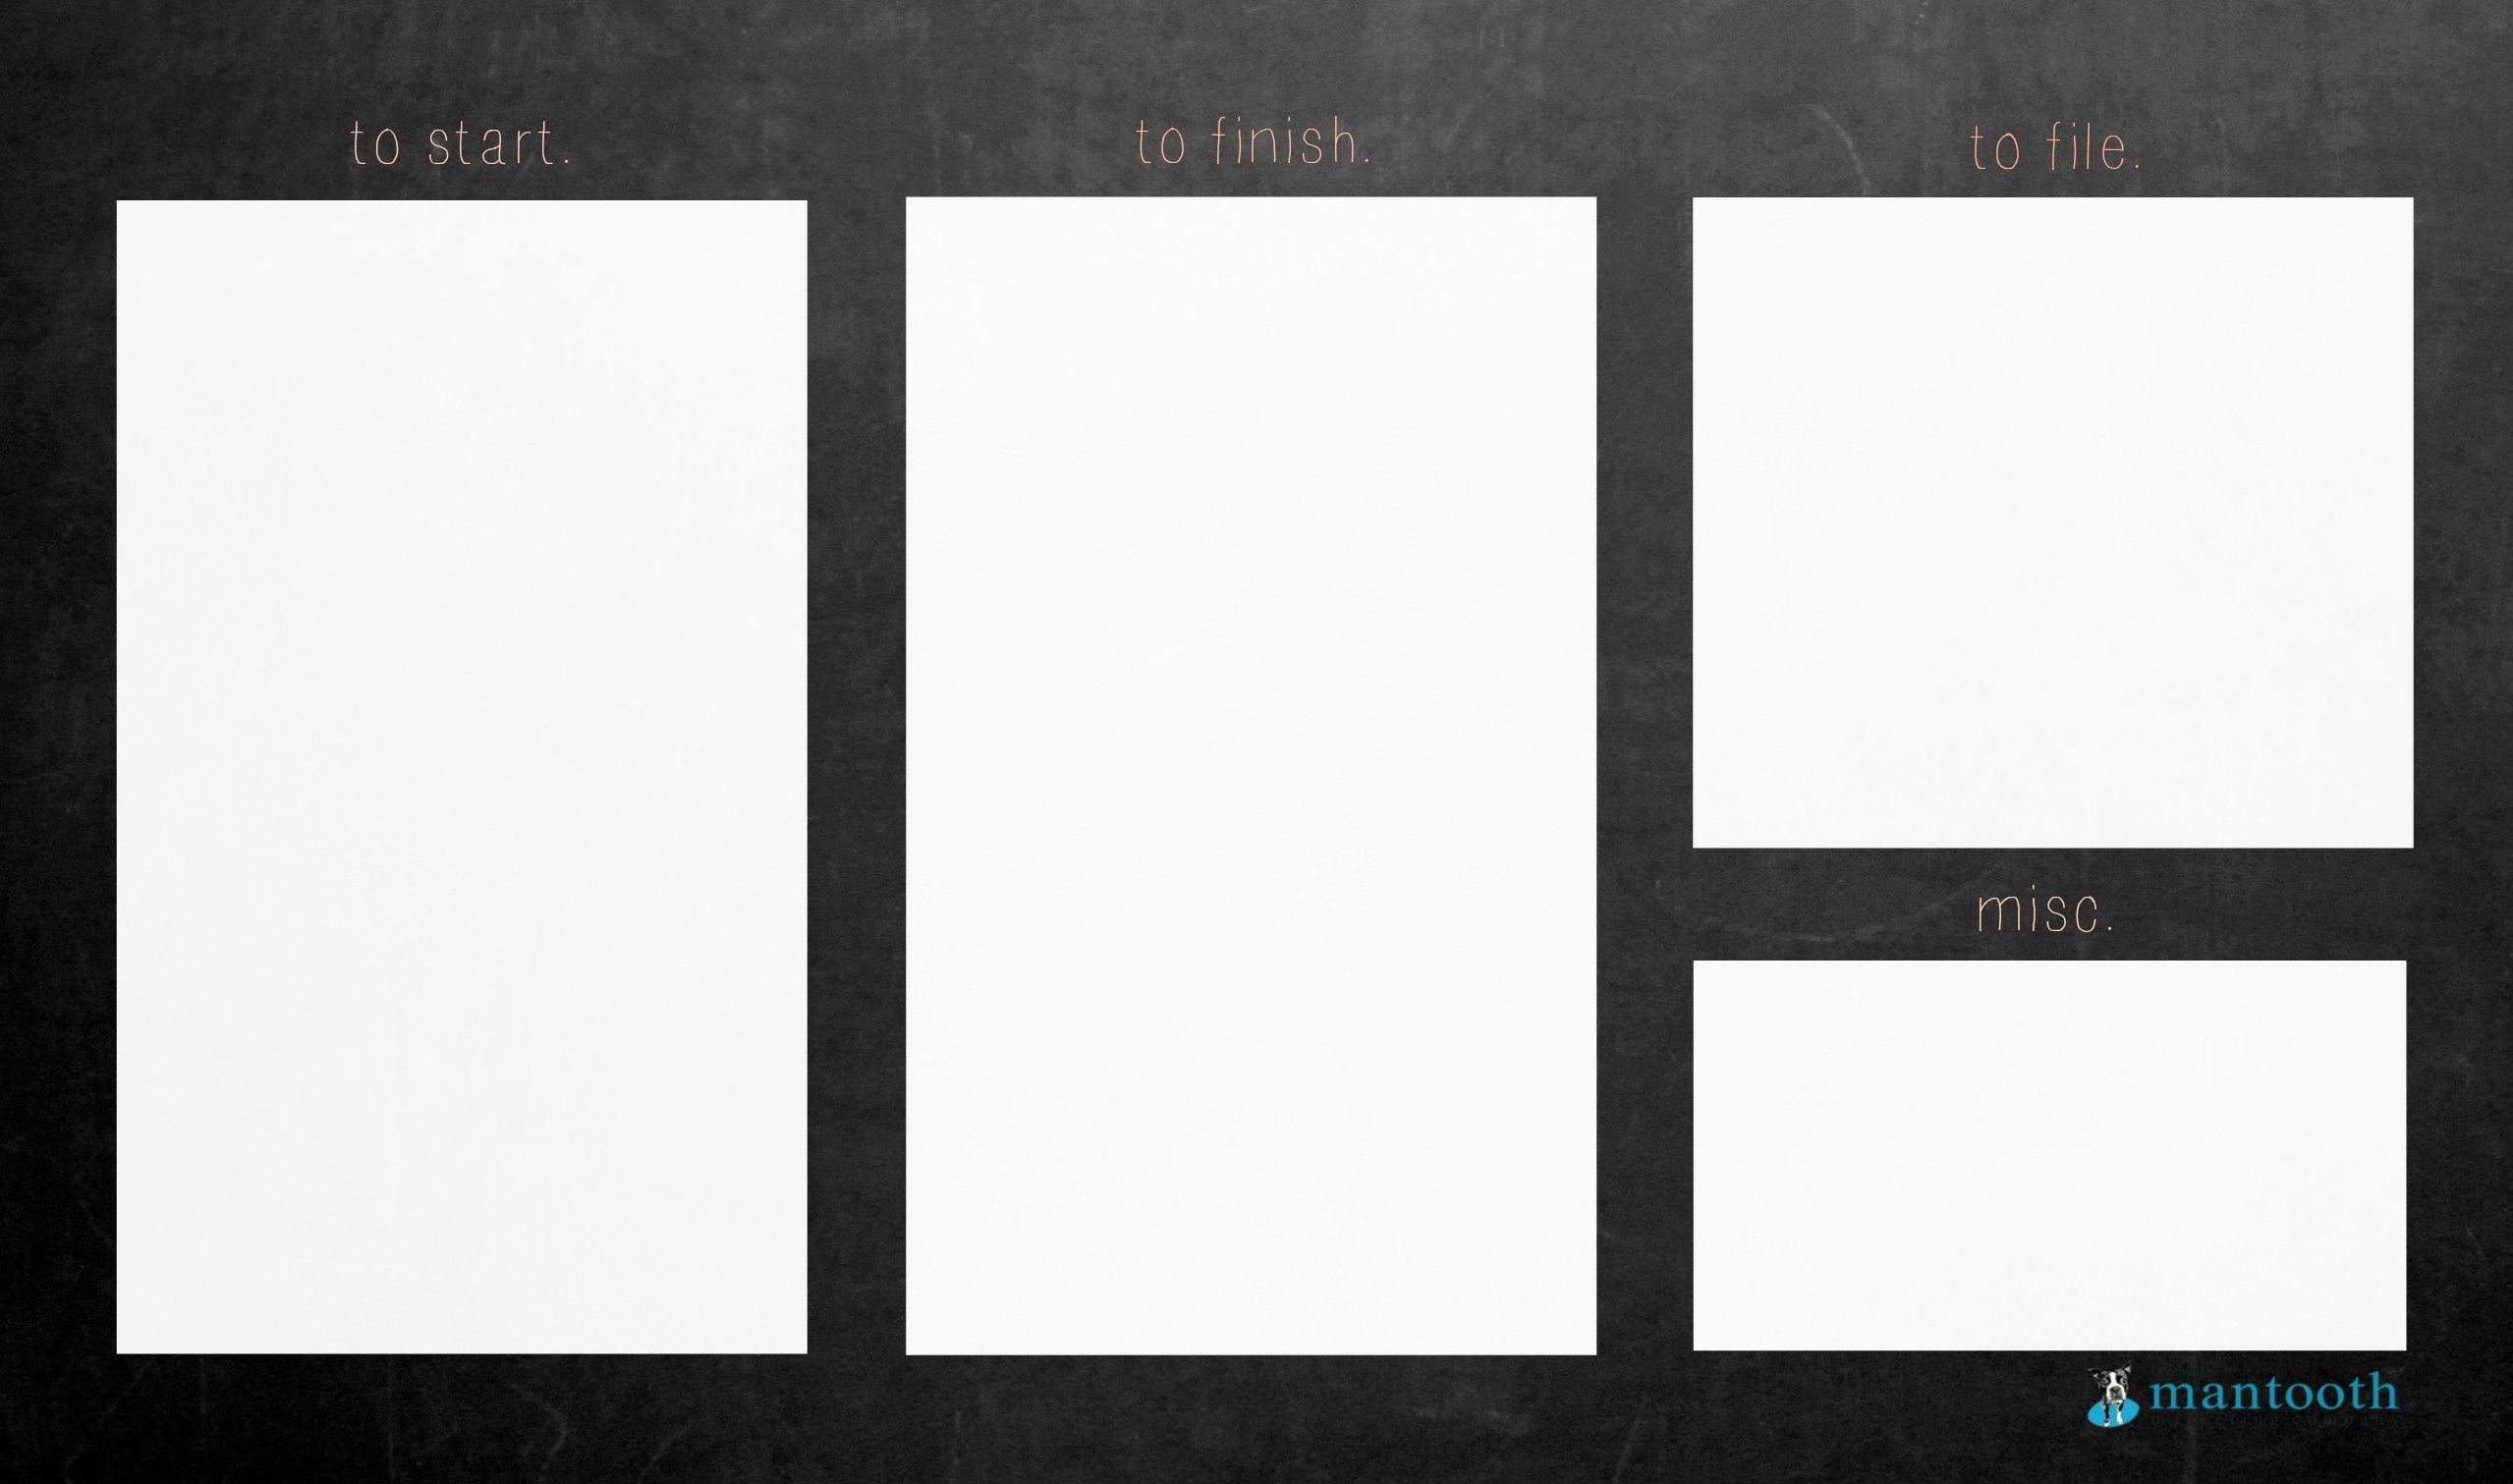 Organization Wallpapers   Top Organization Backgrounds 2558x1511